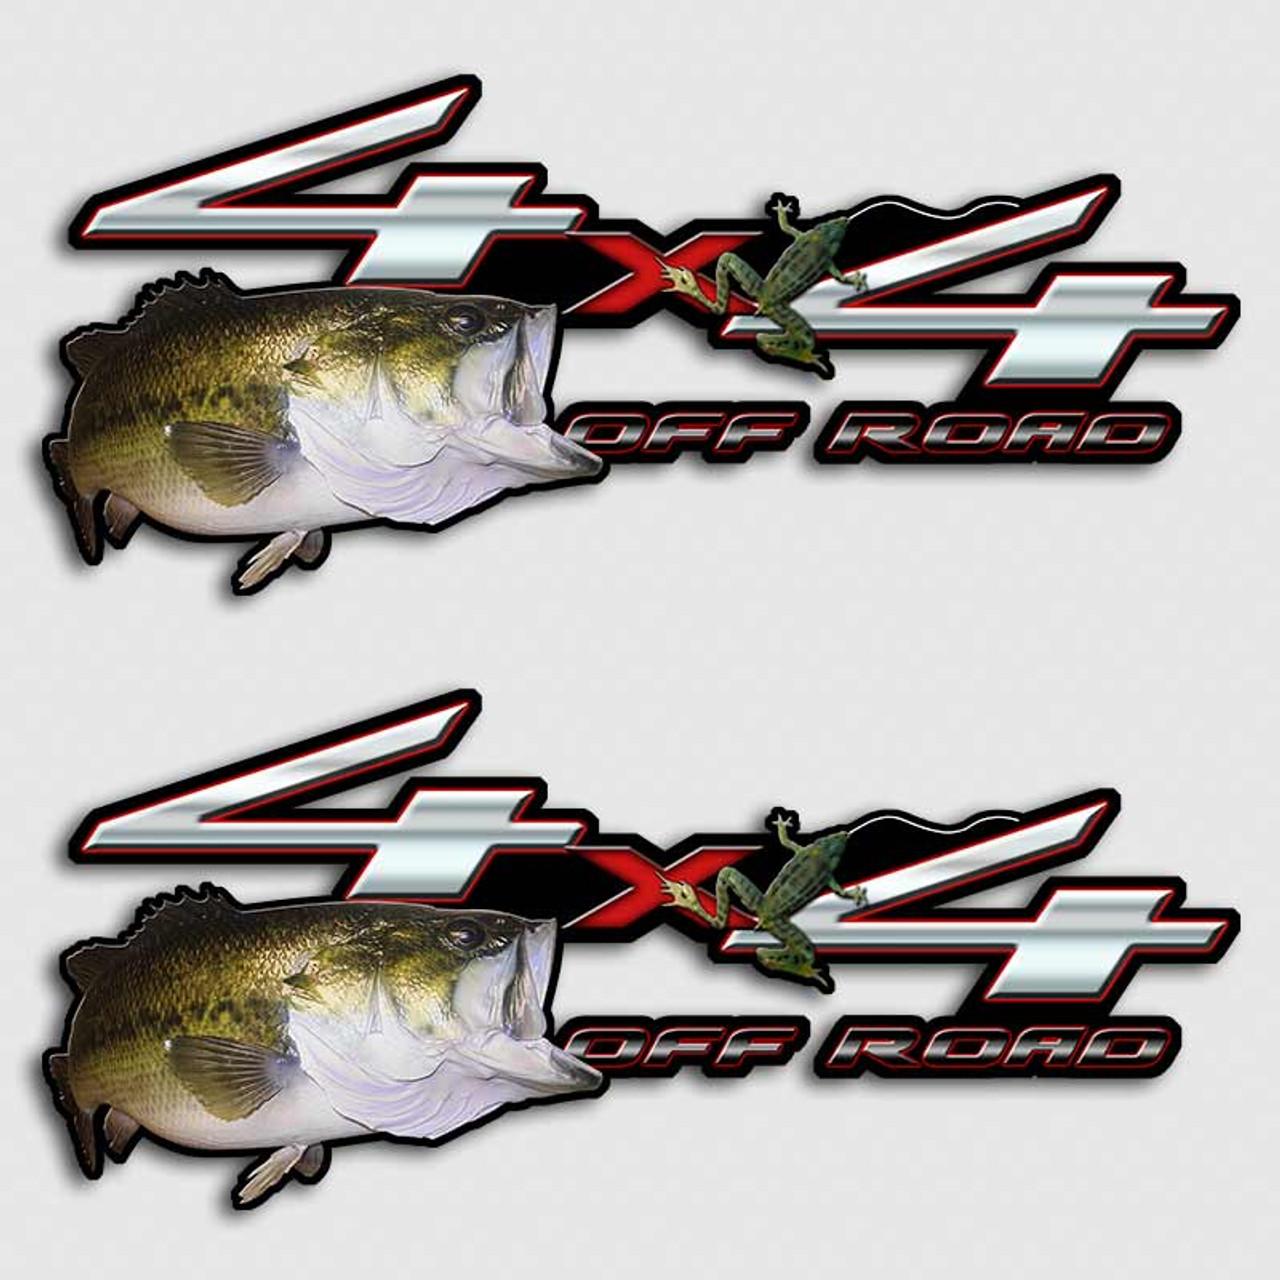 4x4 bass froggin off road truck decals